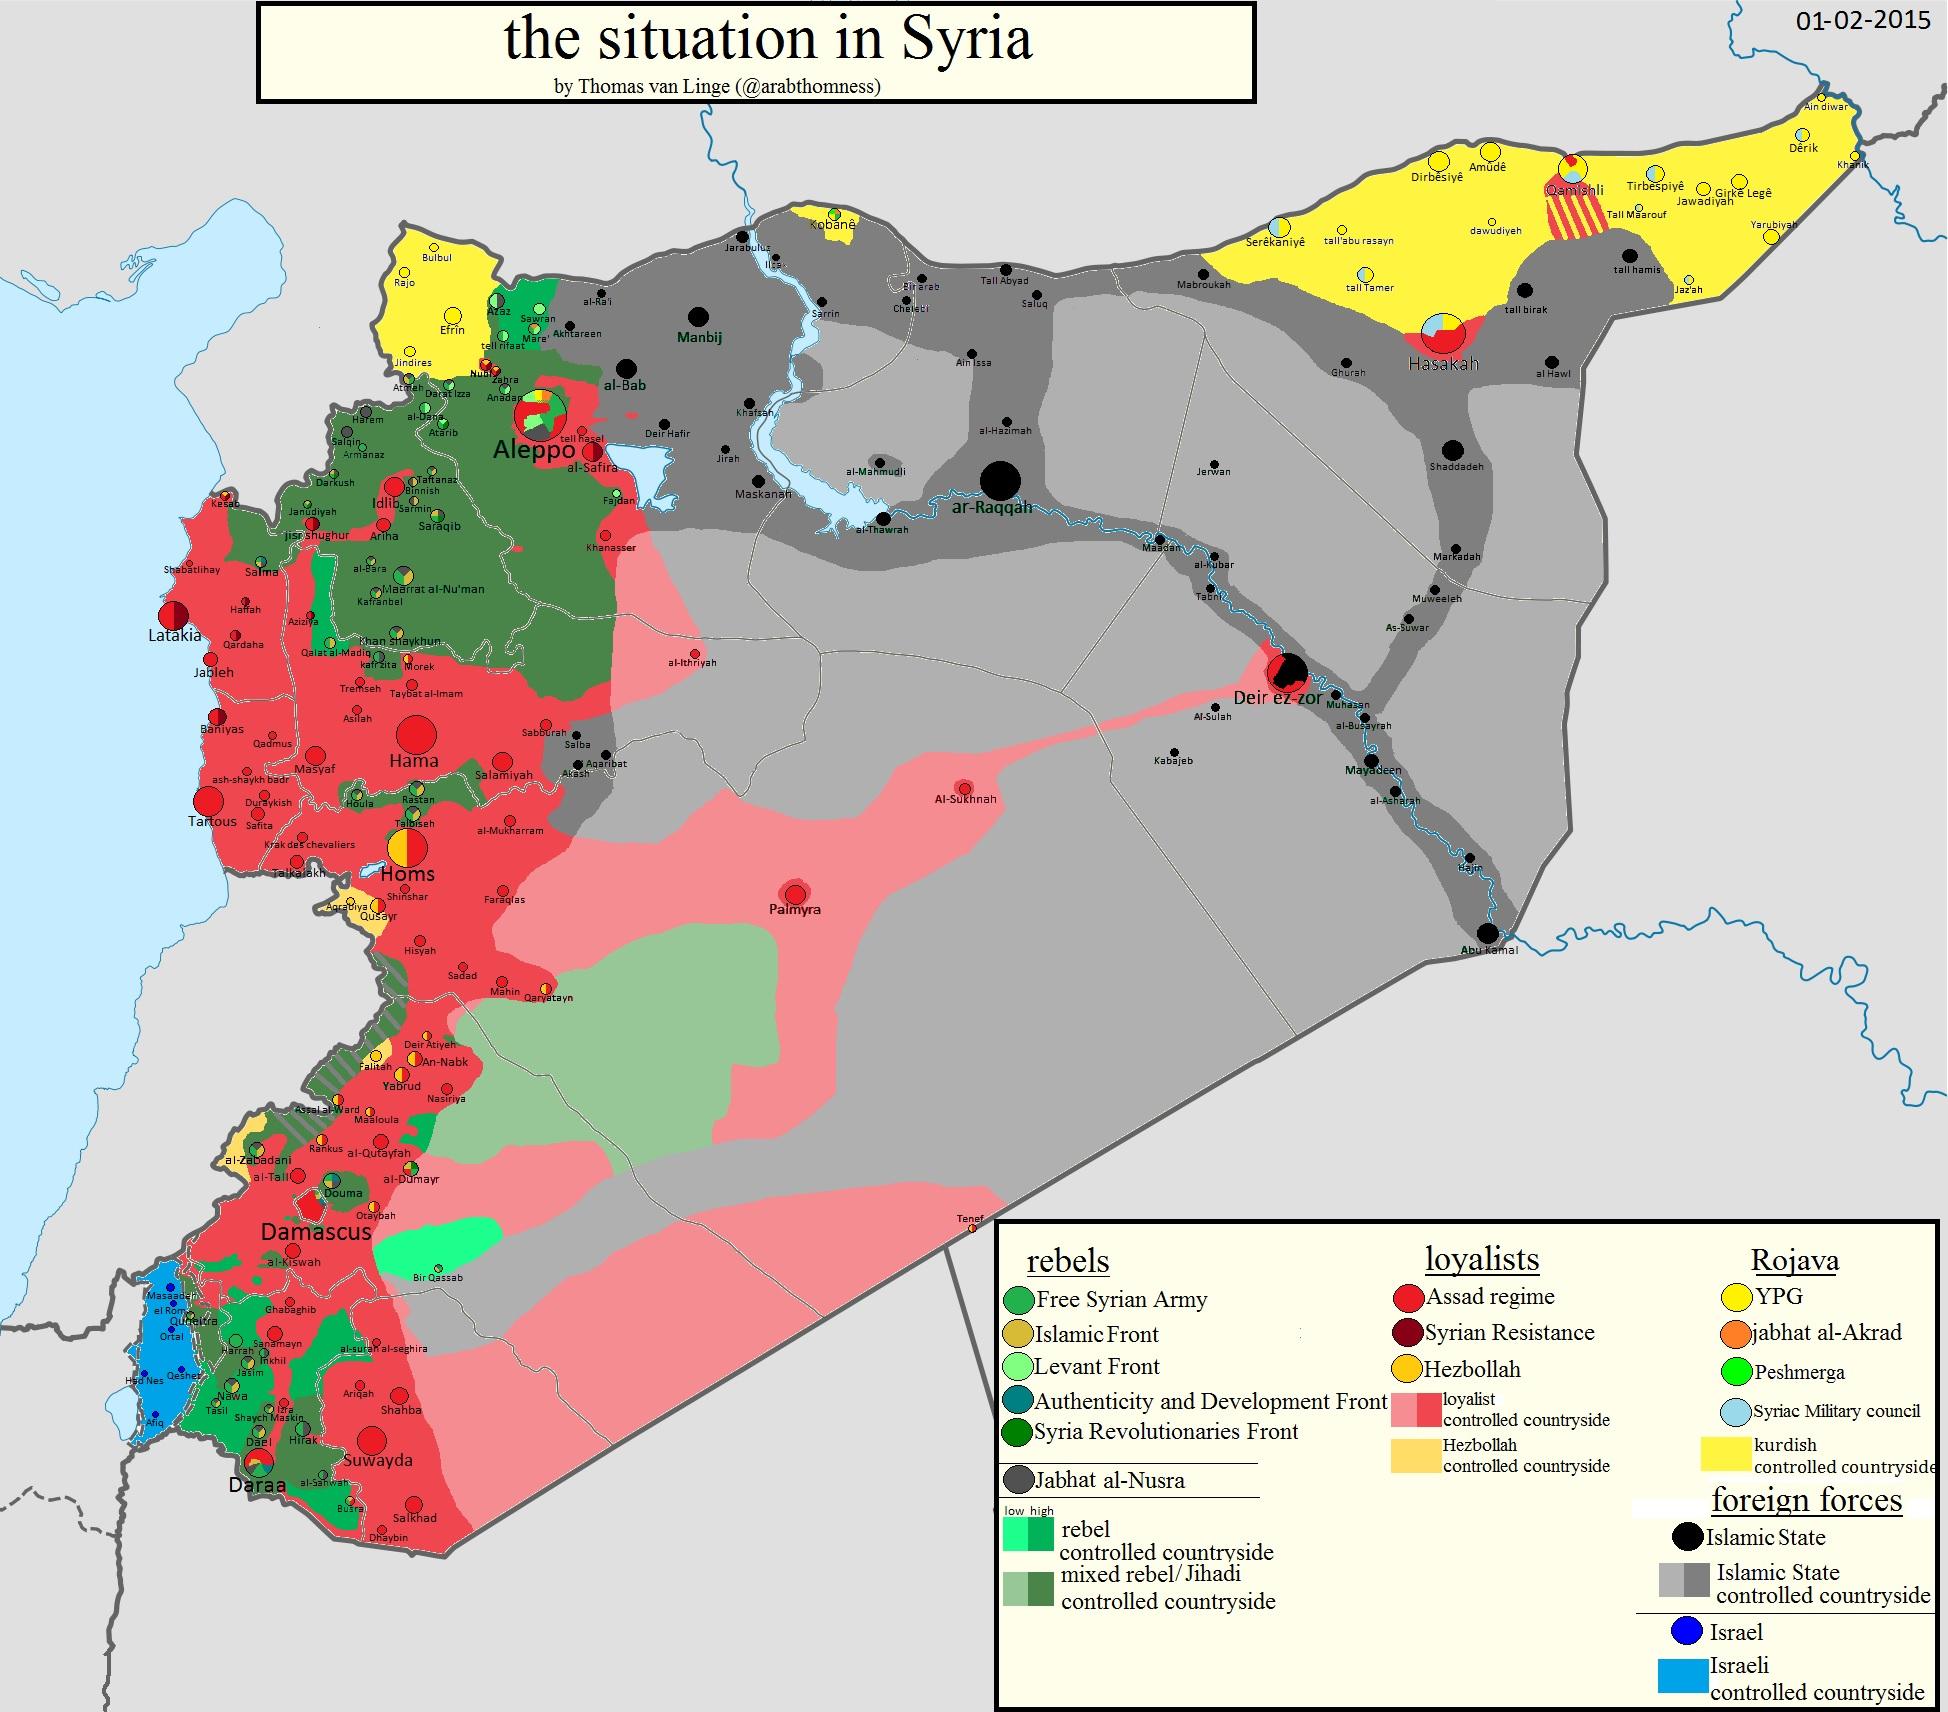 syria-2-2-2015